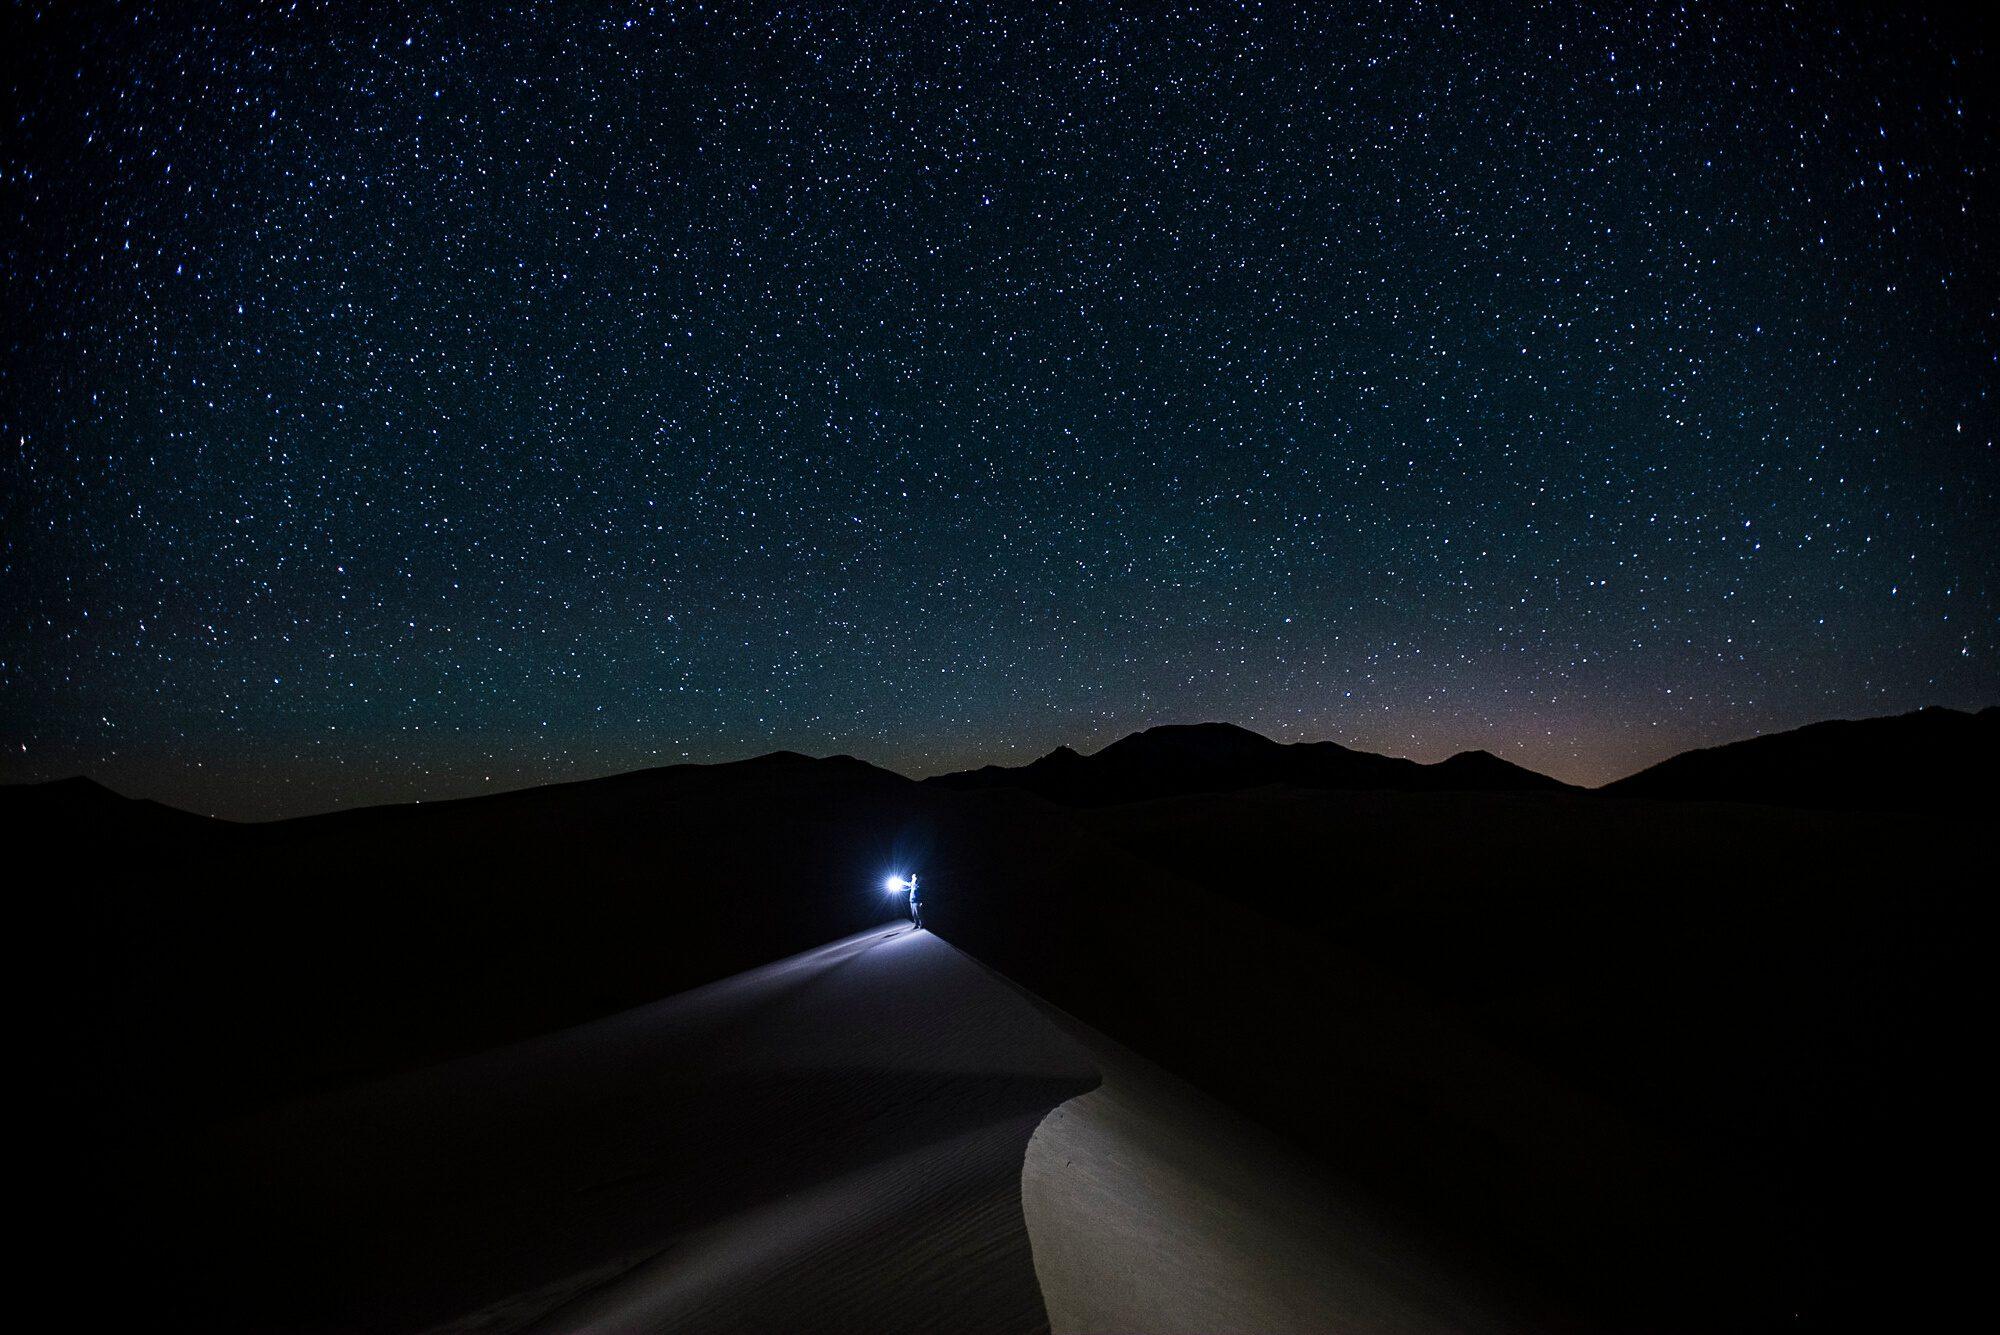 Sand-Dunes-By-Nightfall